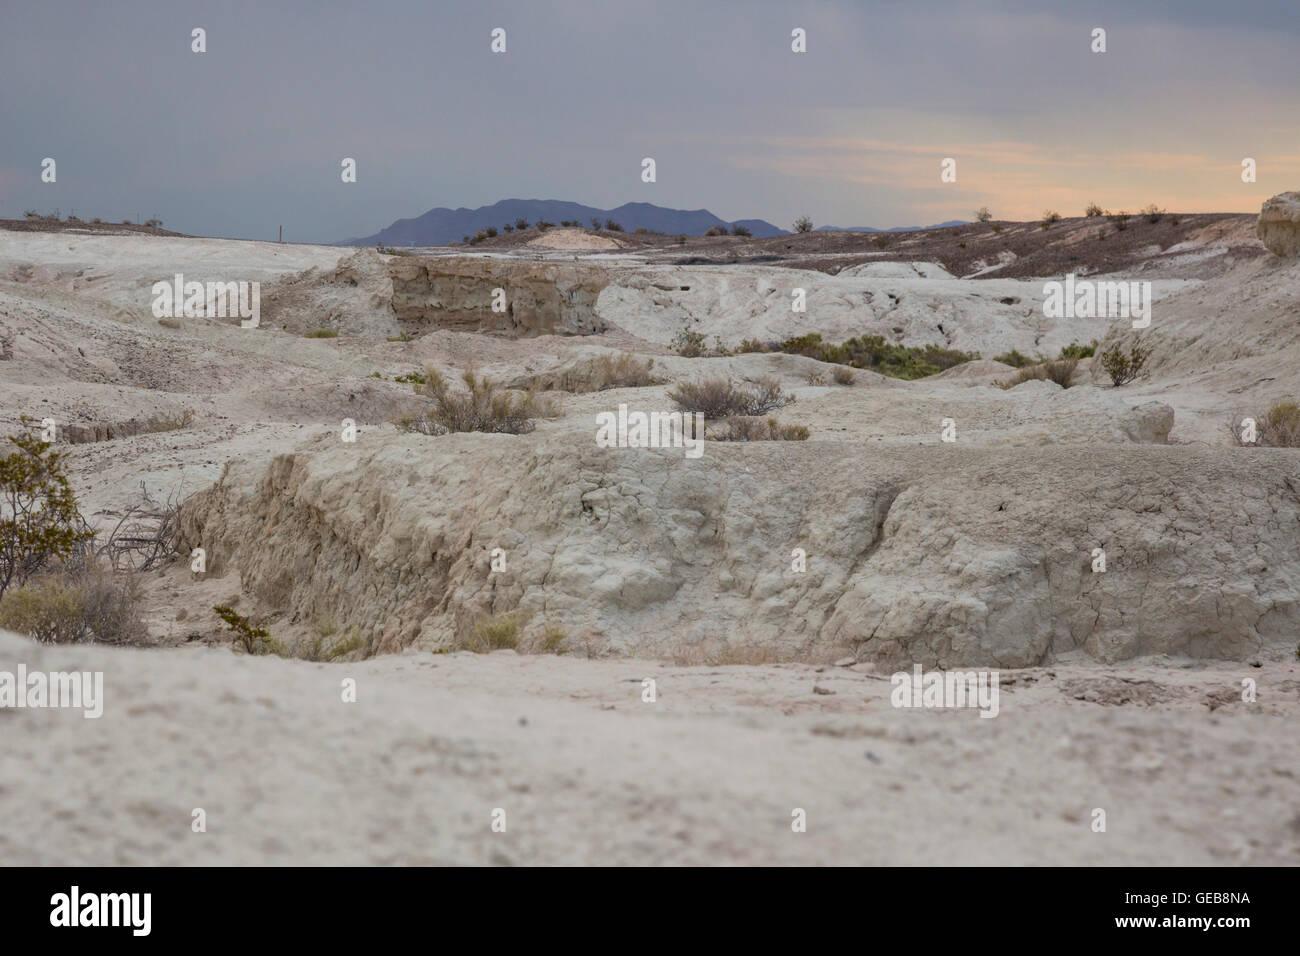 Las Vegas, Nevada - Tule Springs yacimientos fósiles Monumento Nacional, una rica zona paleontológica Imagen De Stock